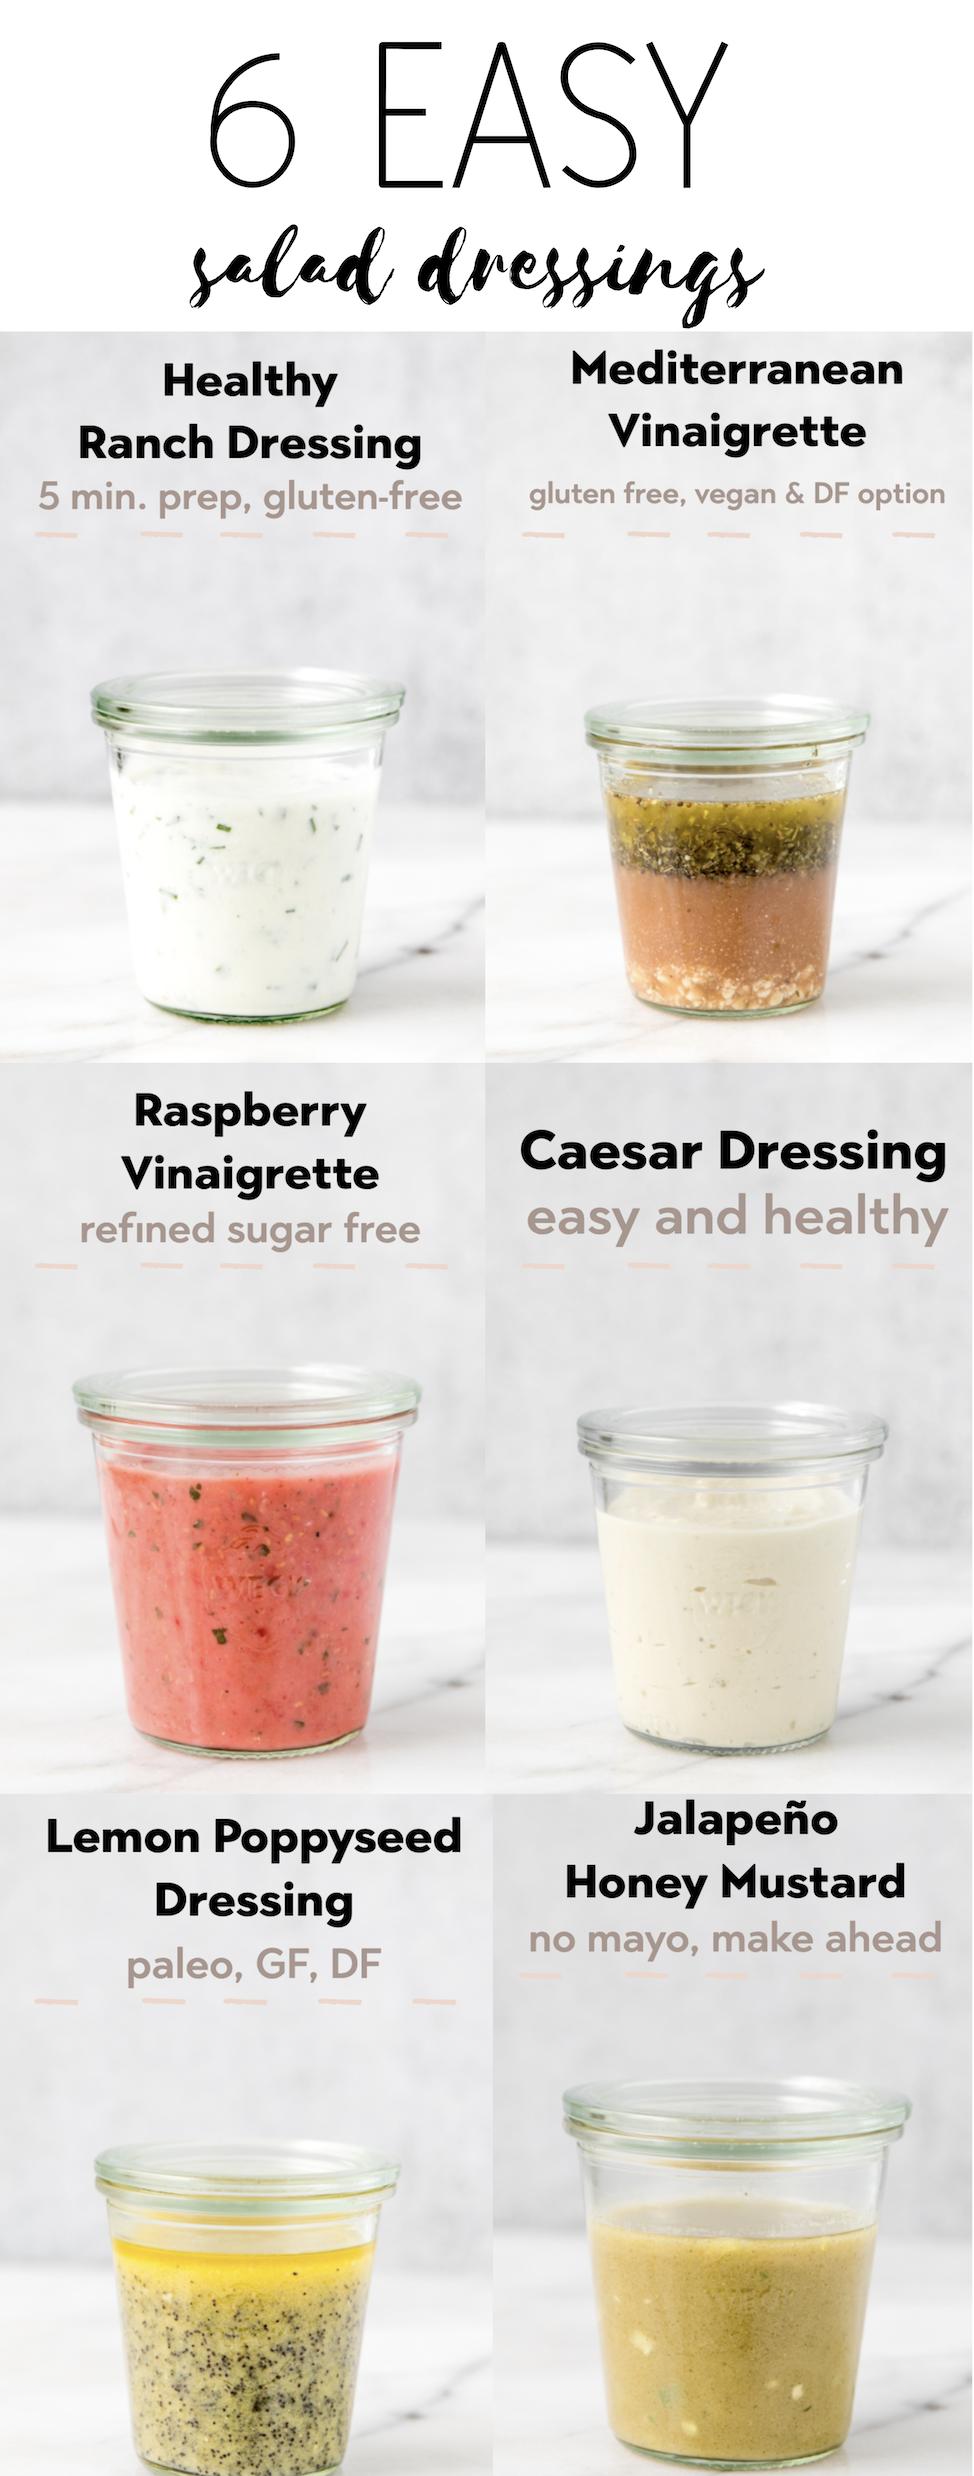 6 Staple Summer Salad Dressings You Ll Actually Love Kroll S Korner Recipe Easy Salad Dressing Homemade Salads Salad Dressing Recipes Healthy [ 2476 x 974 Pixel ]